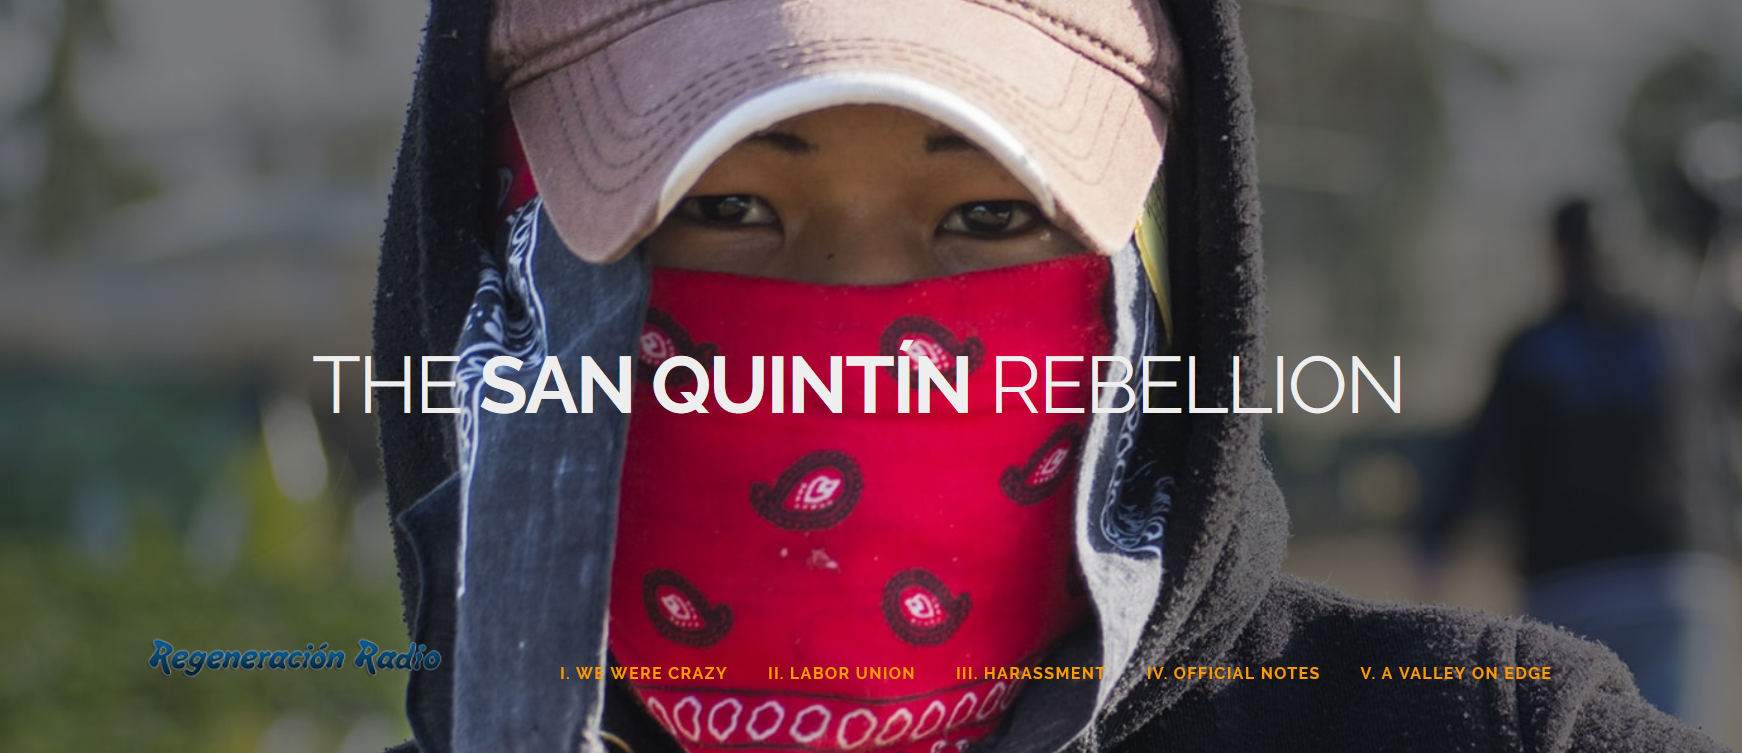 The San Quintín Rebellion